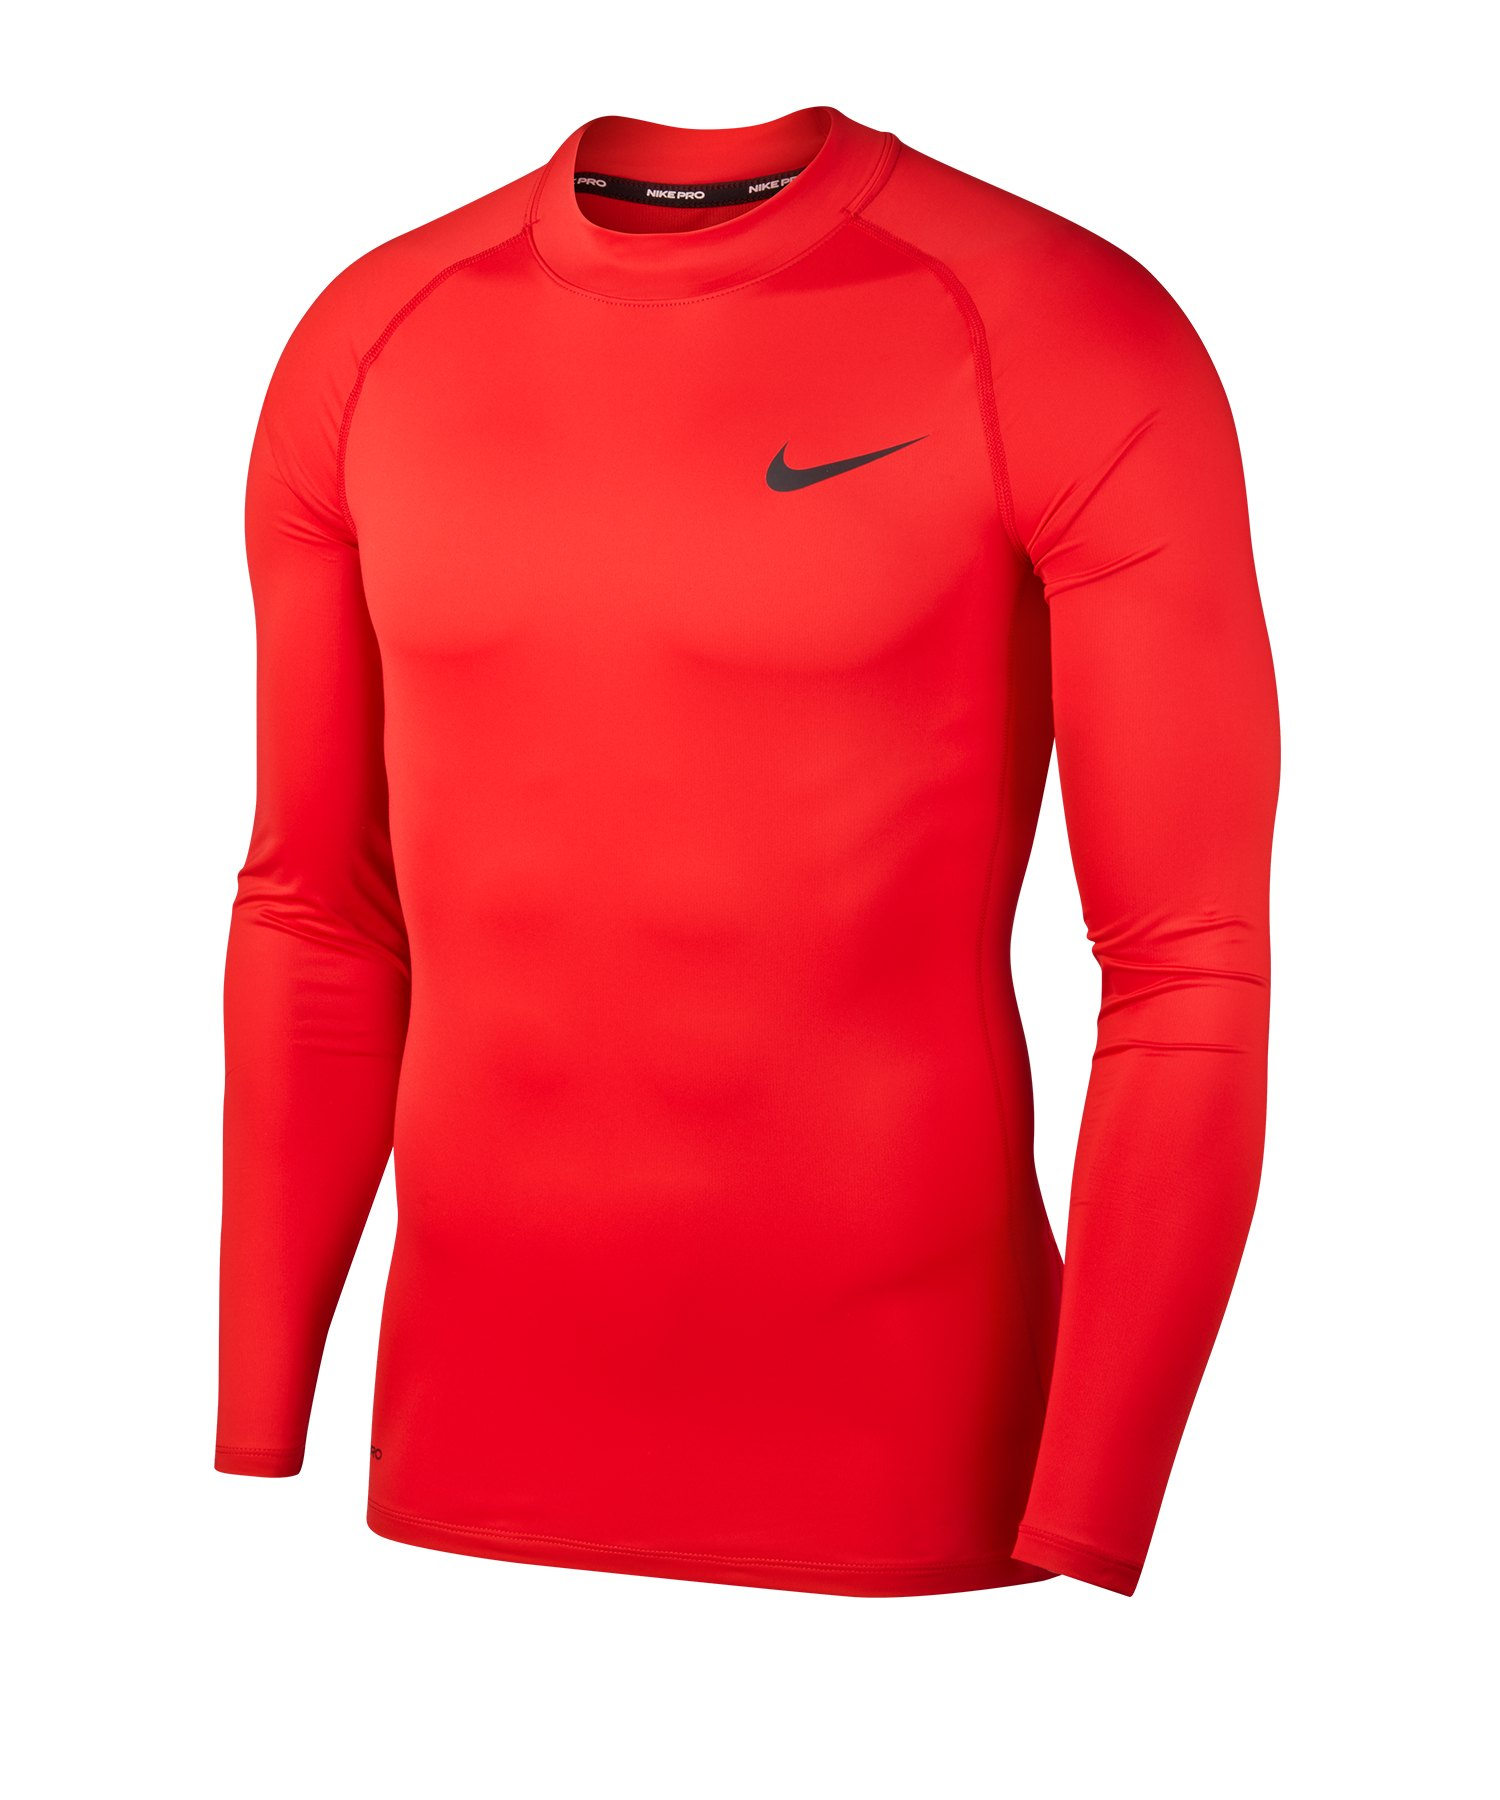 Nike Pro Trainingsshirt langarm Rot F657 - rot